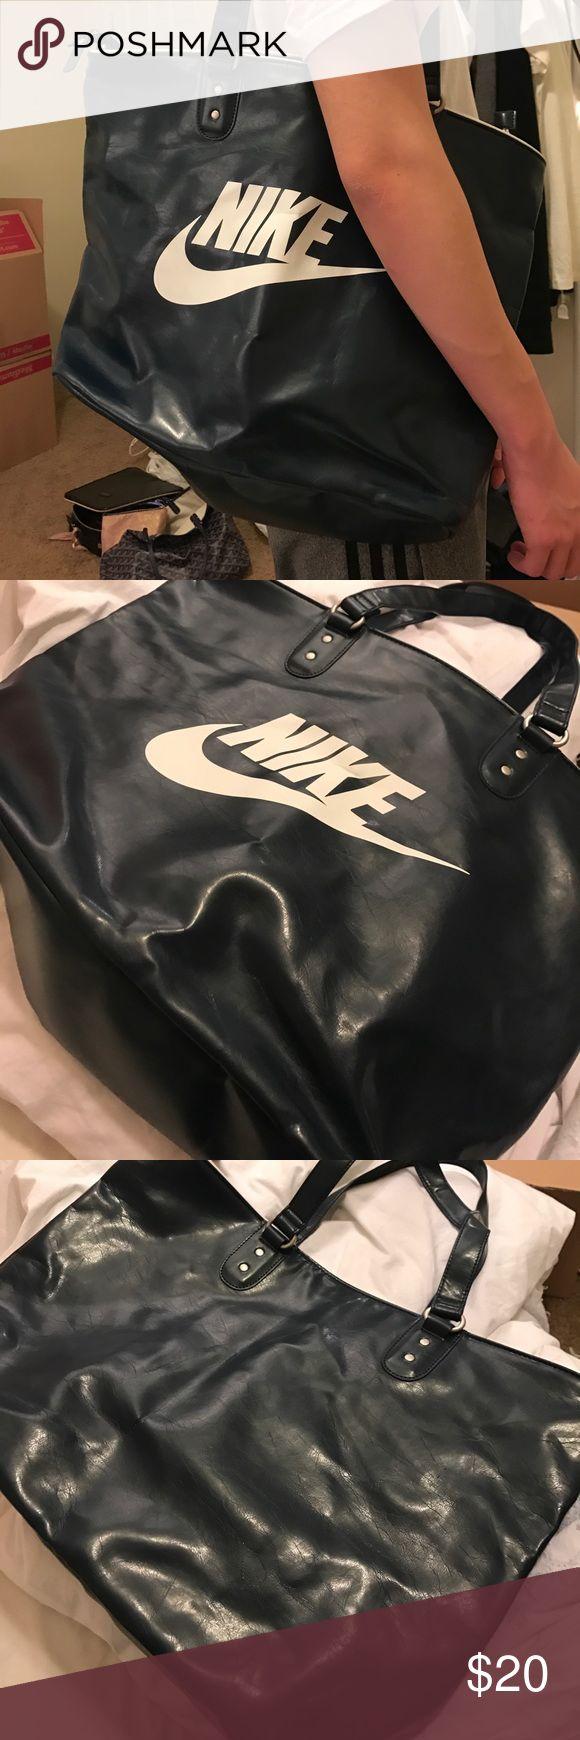 ‼️ Large Nike gym/shopping shoulder bag ‼️Cool and super fashion Nike bag. Last season's best selling bag. Nike Bags Shoulder Bags